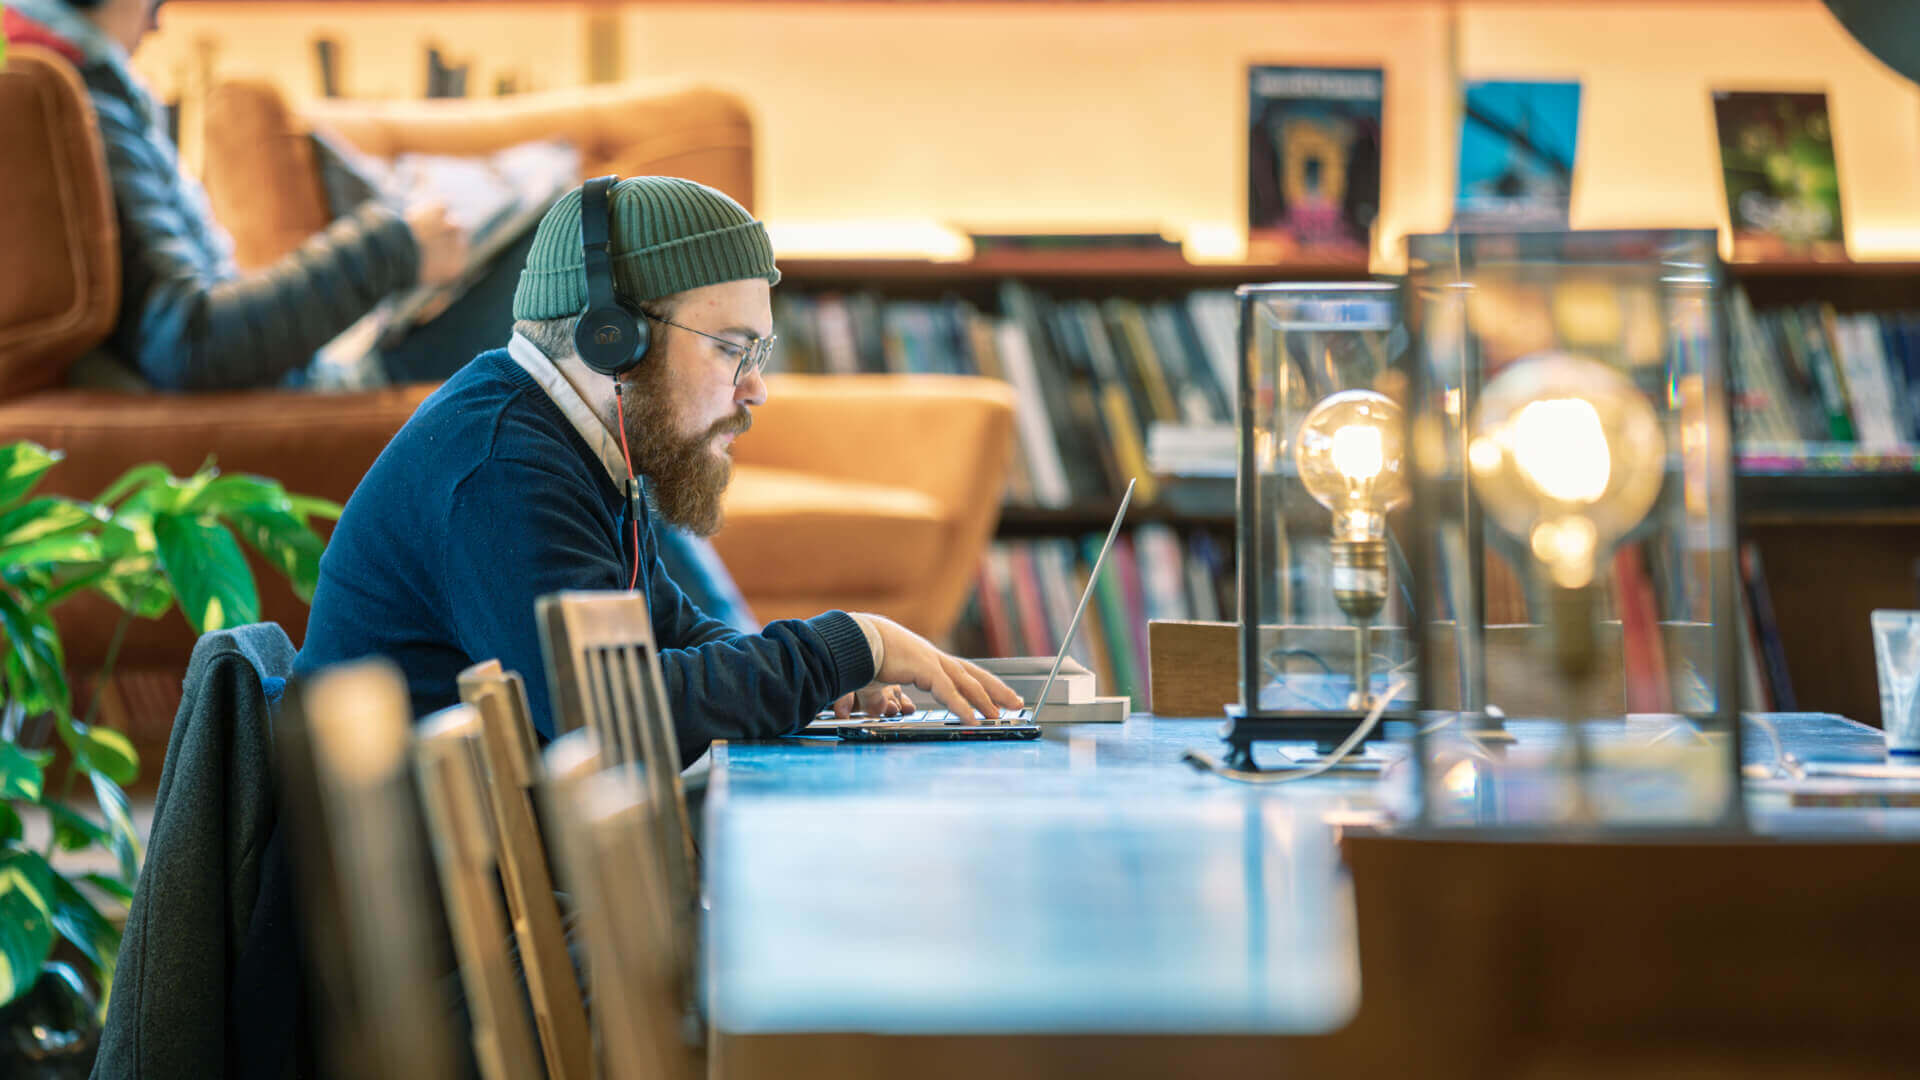 aatvos_Grünerløkka_Library-4